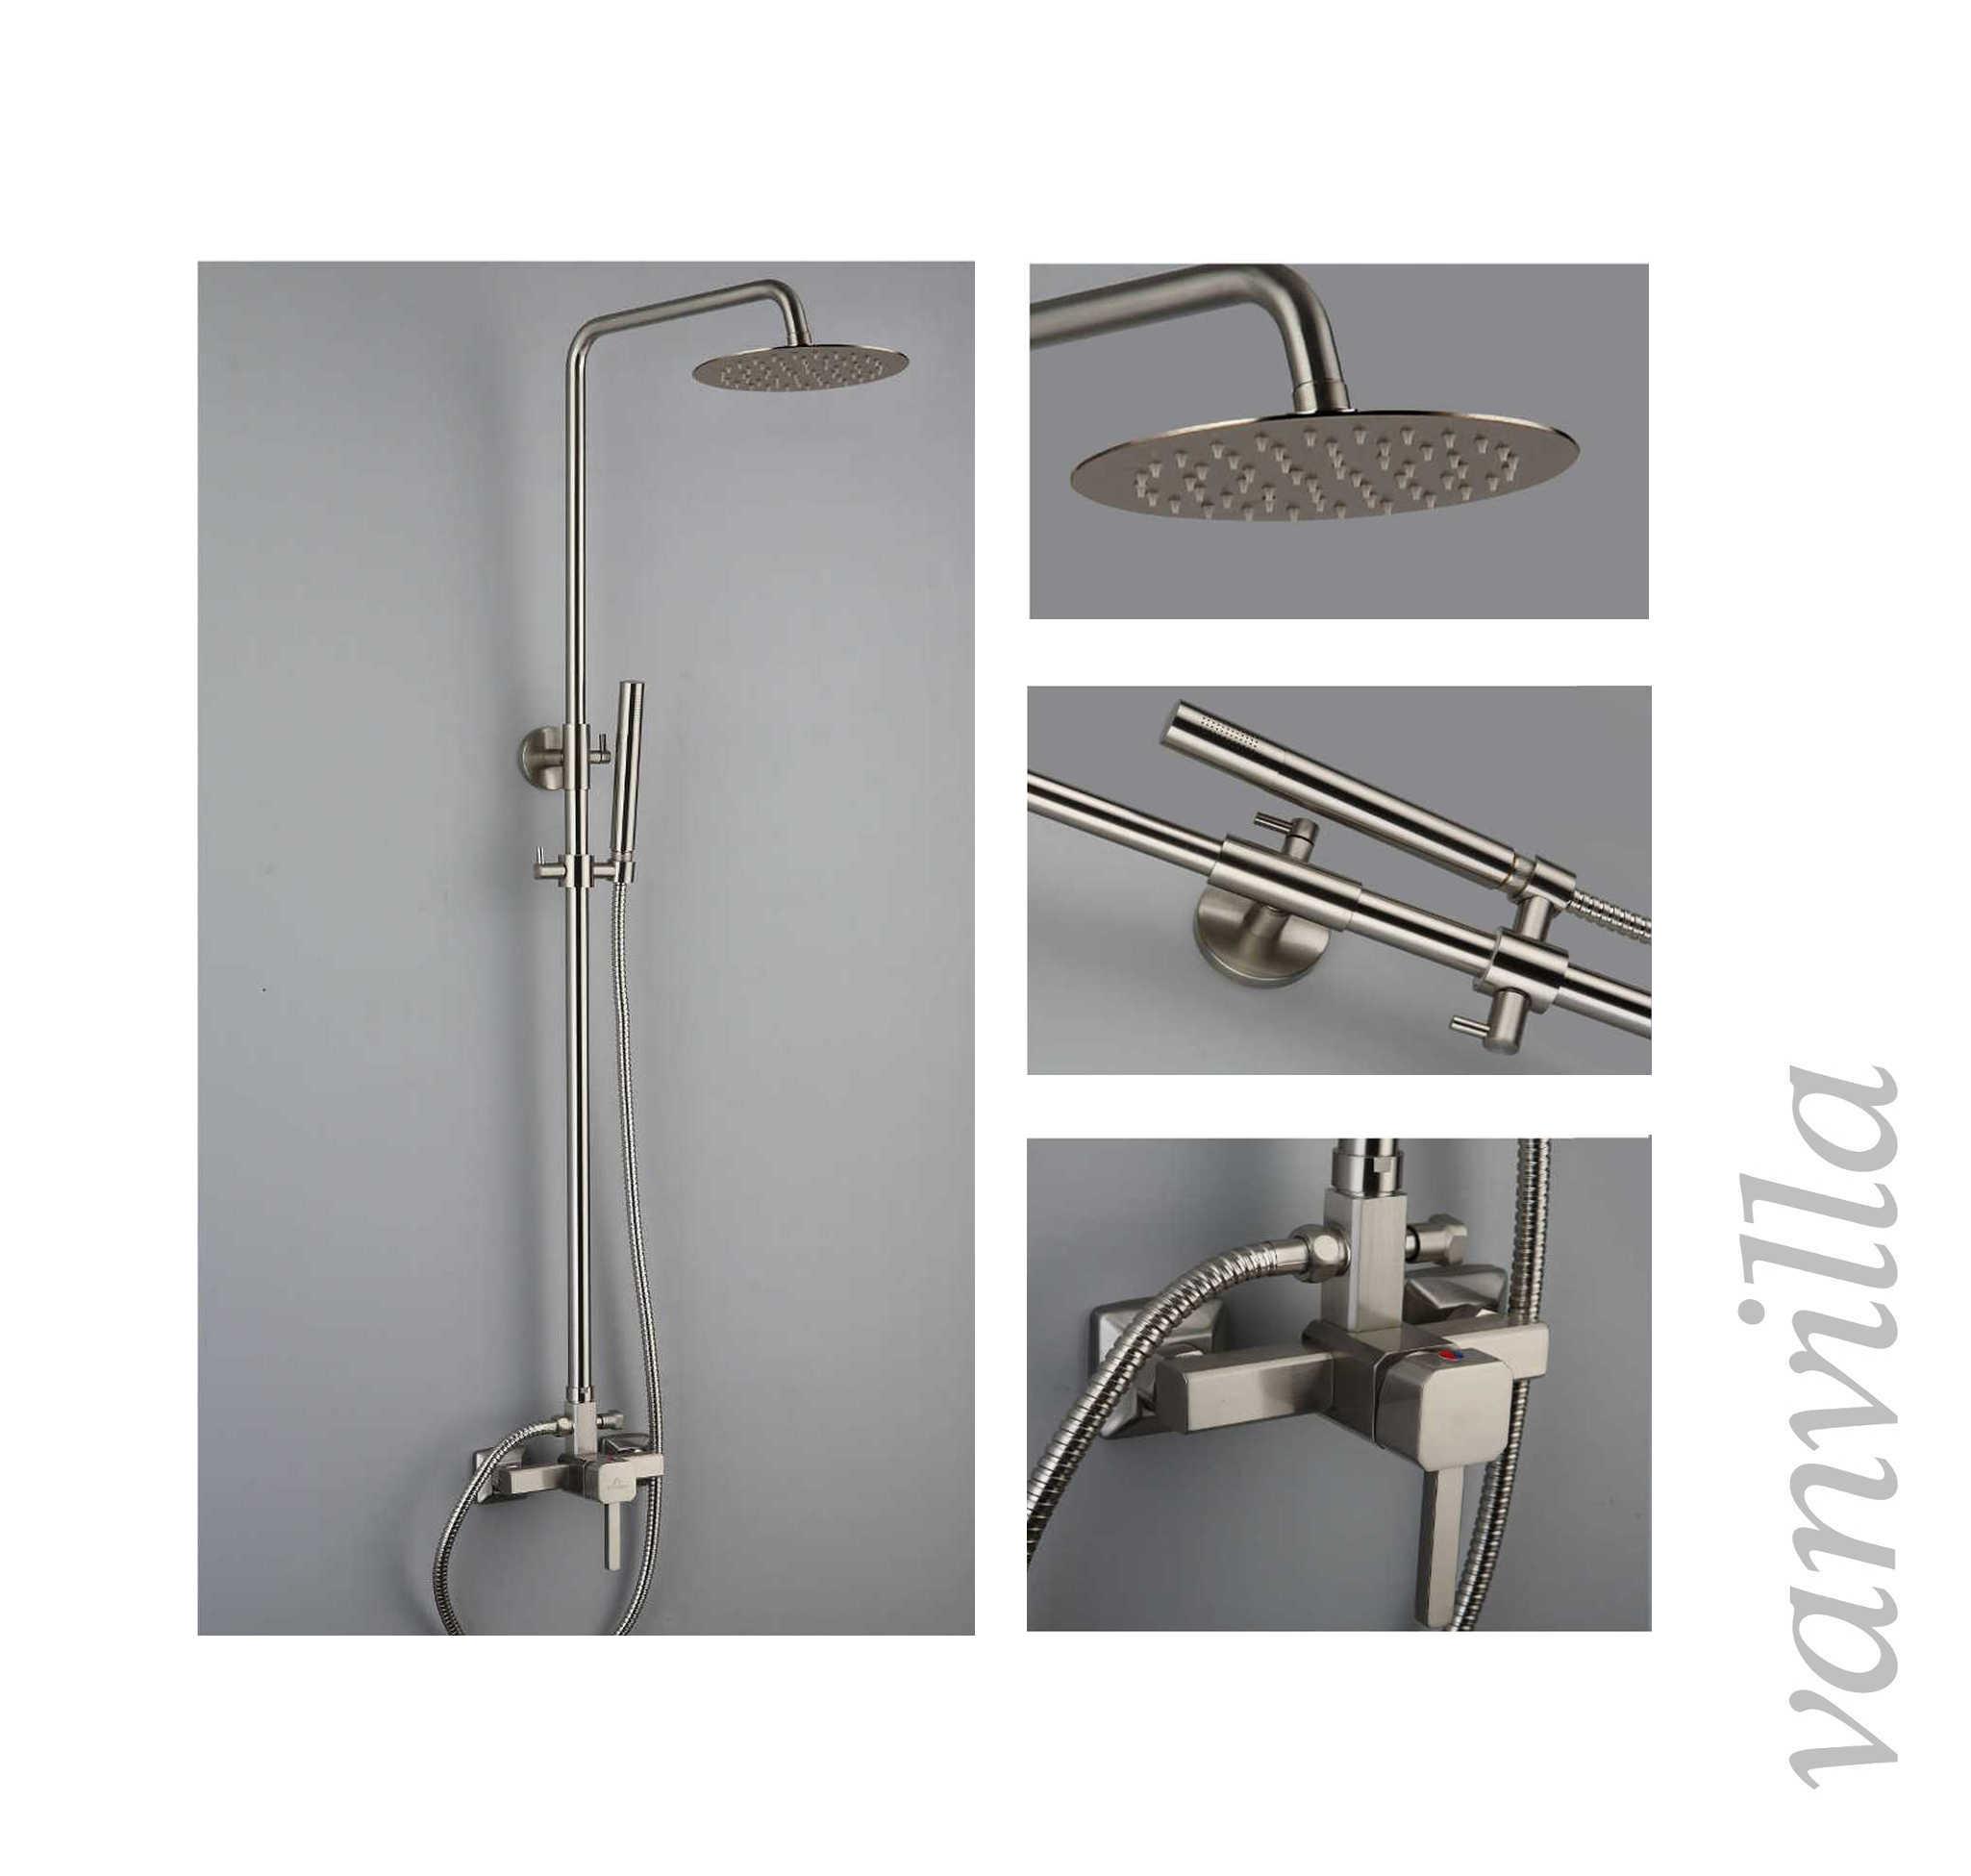 Duscharmatur Set : Duscharmatur-Brausearmatur-Dusch-Set-Regendusche-Brausegarnitur